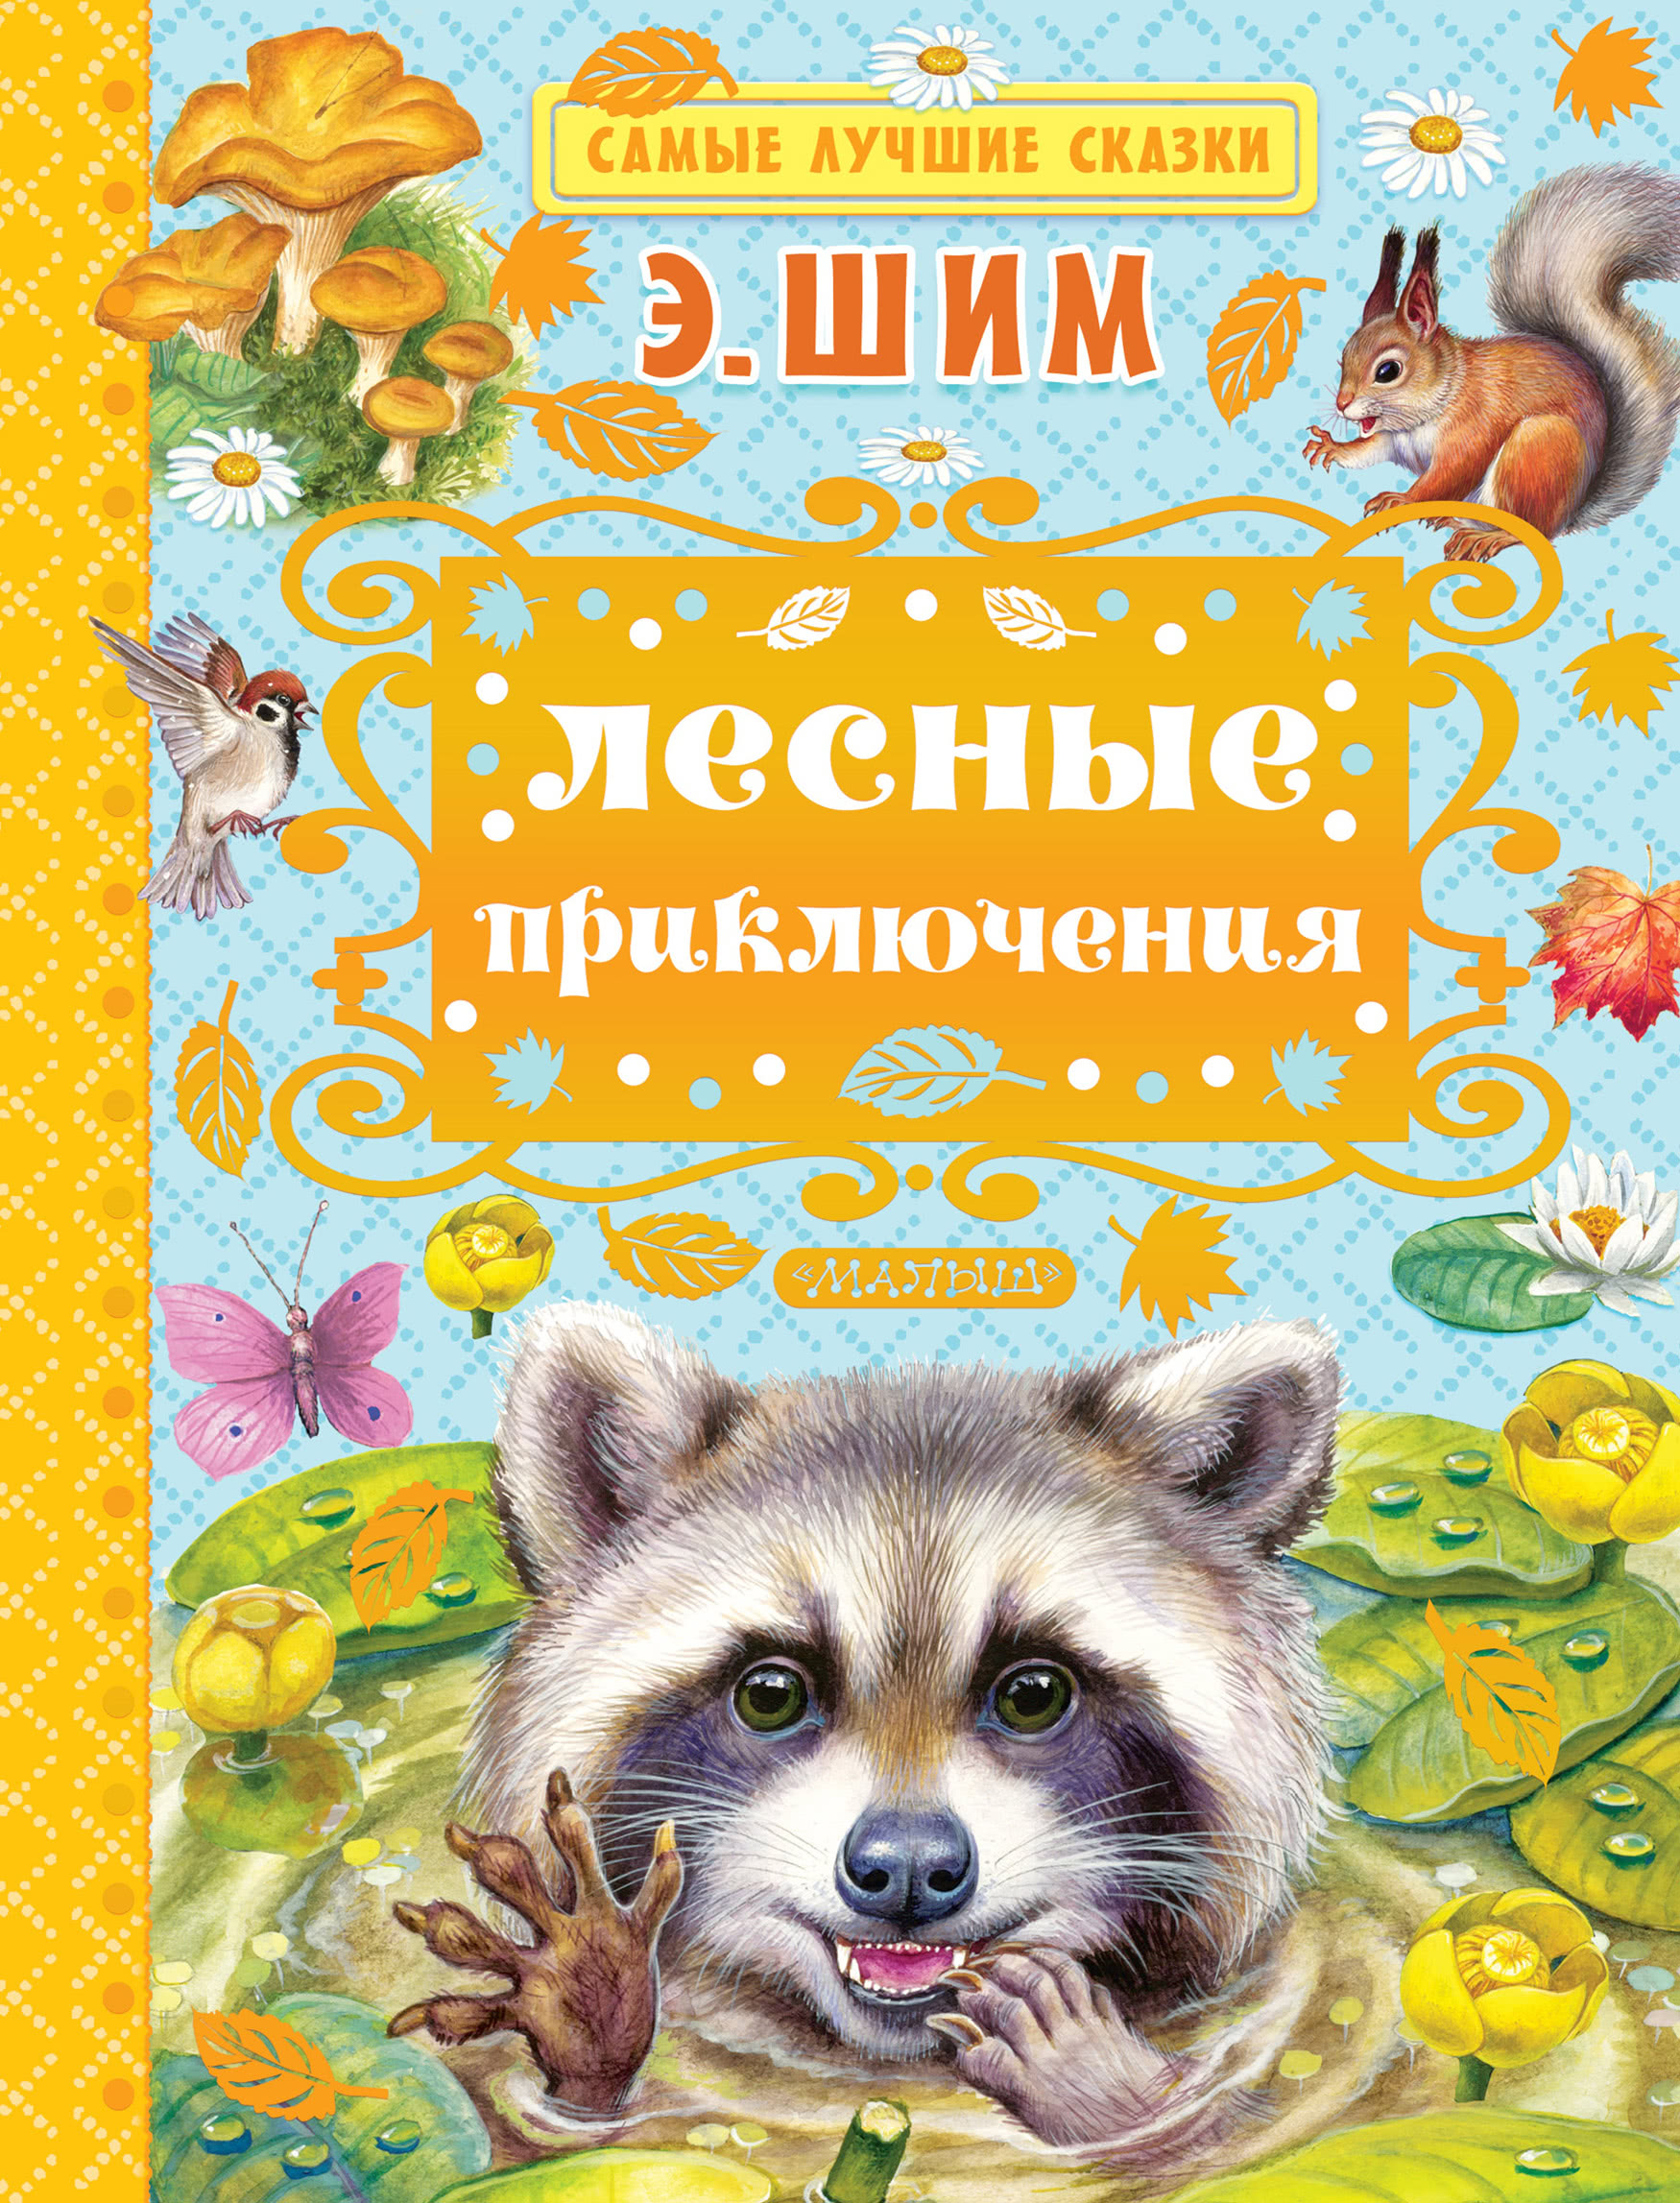 Эдуард Шим Лесные приключения (сборник) шим эдуард юрьевич приключения зайца